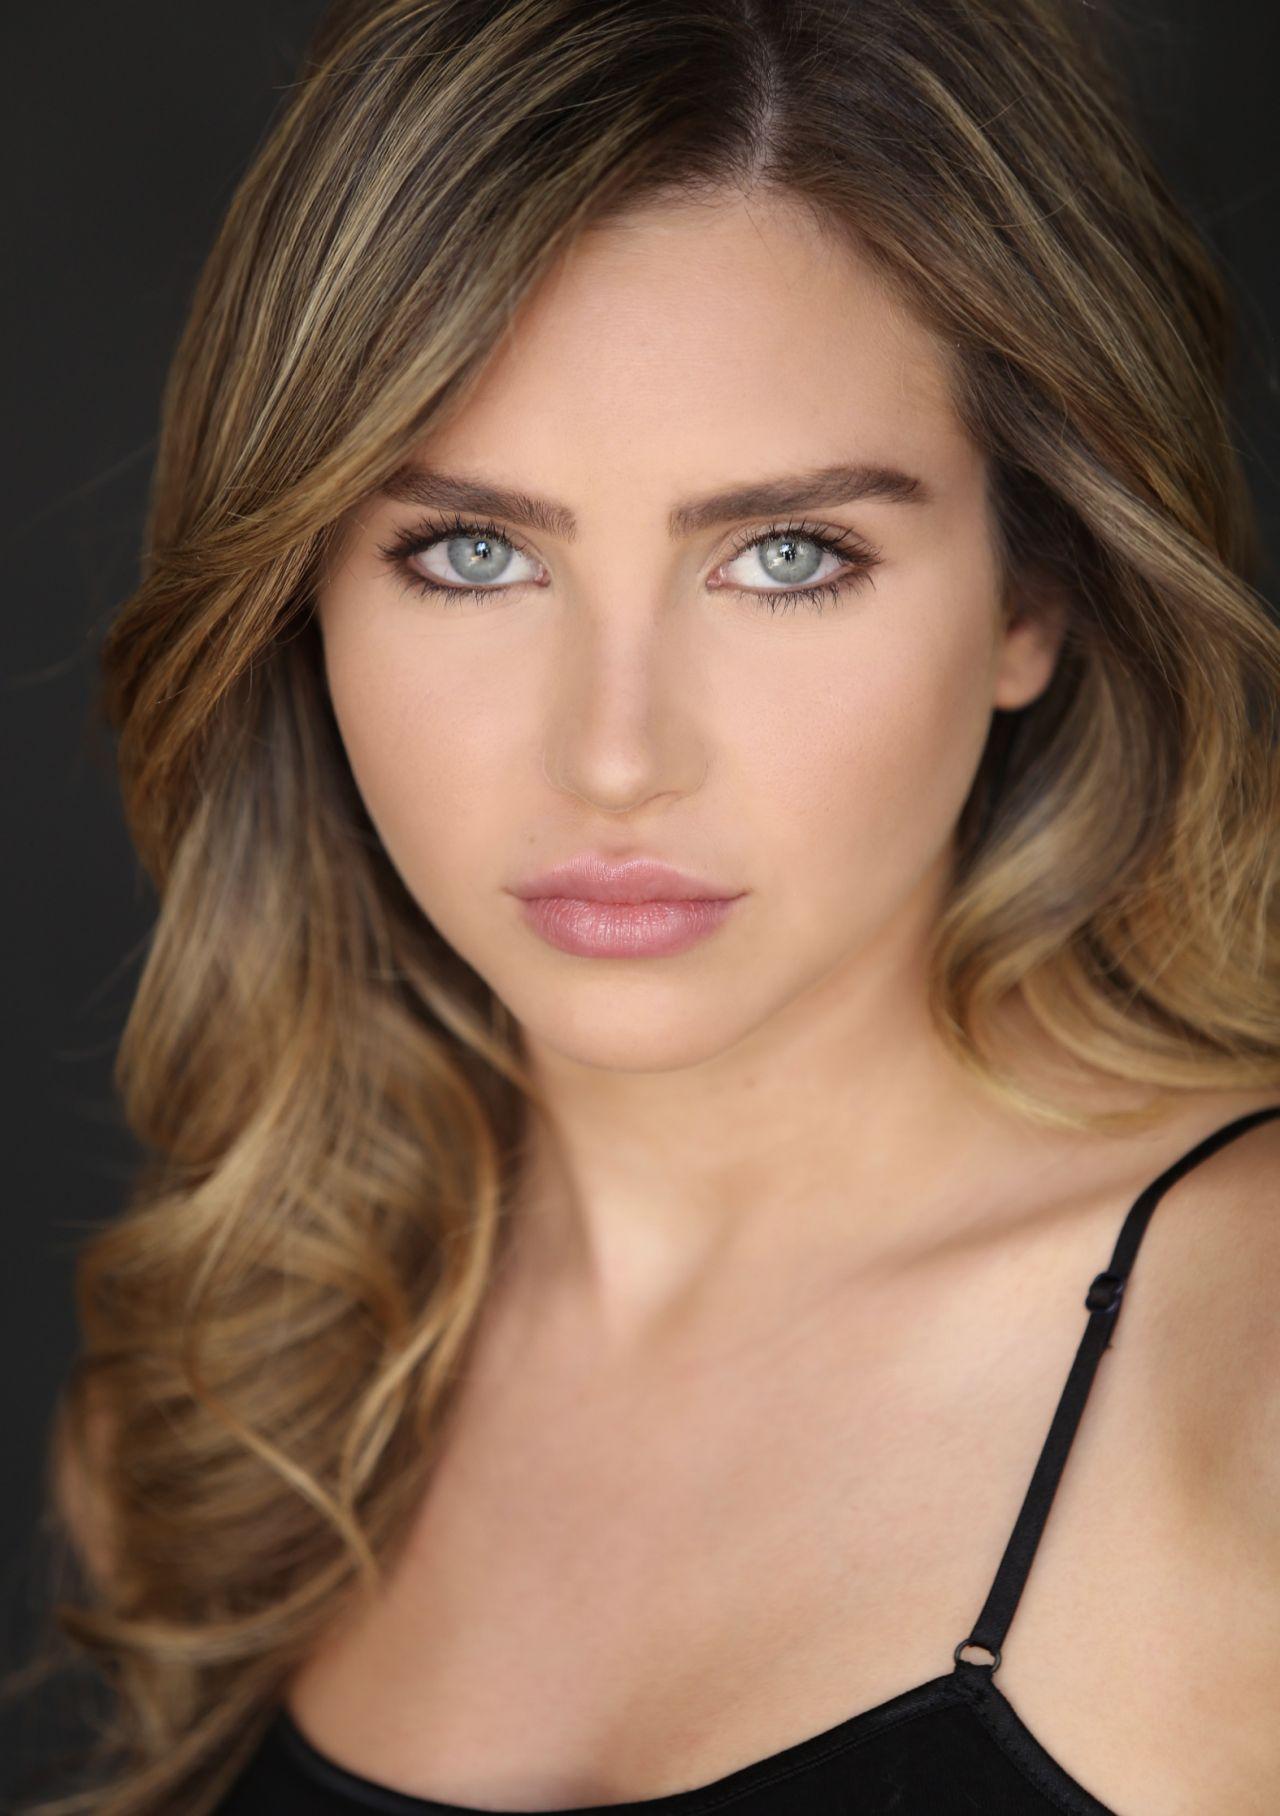 Ryan Newman Actress | Foto Bugil Bokep 2017